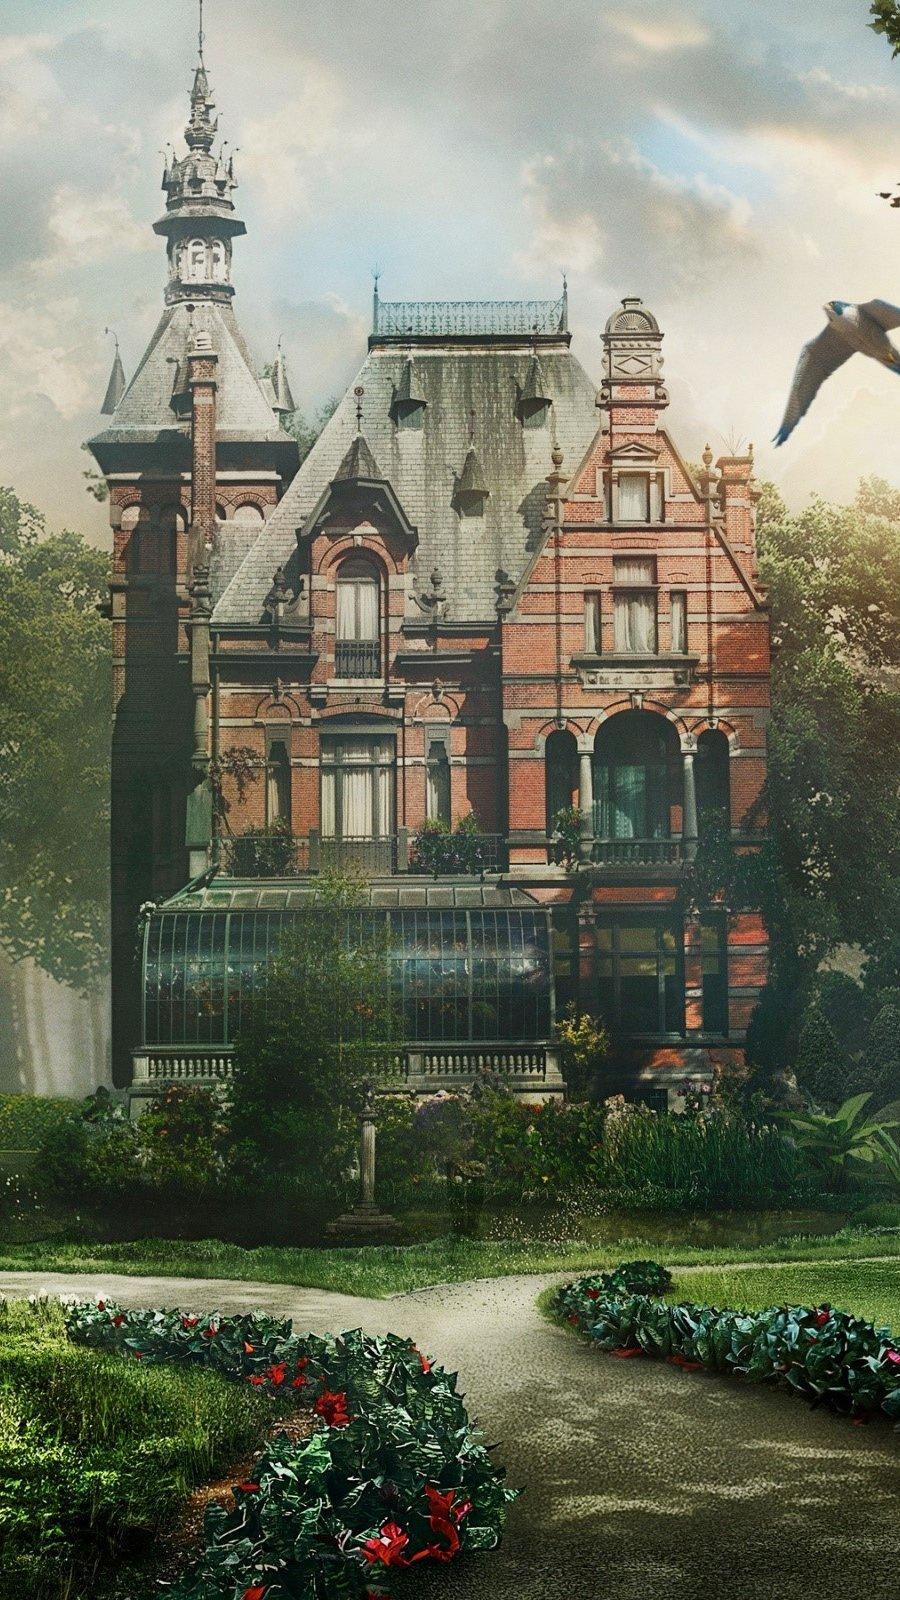 Fondos de pantalla Beautiful Fantasy Deam Home Vertical